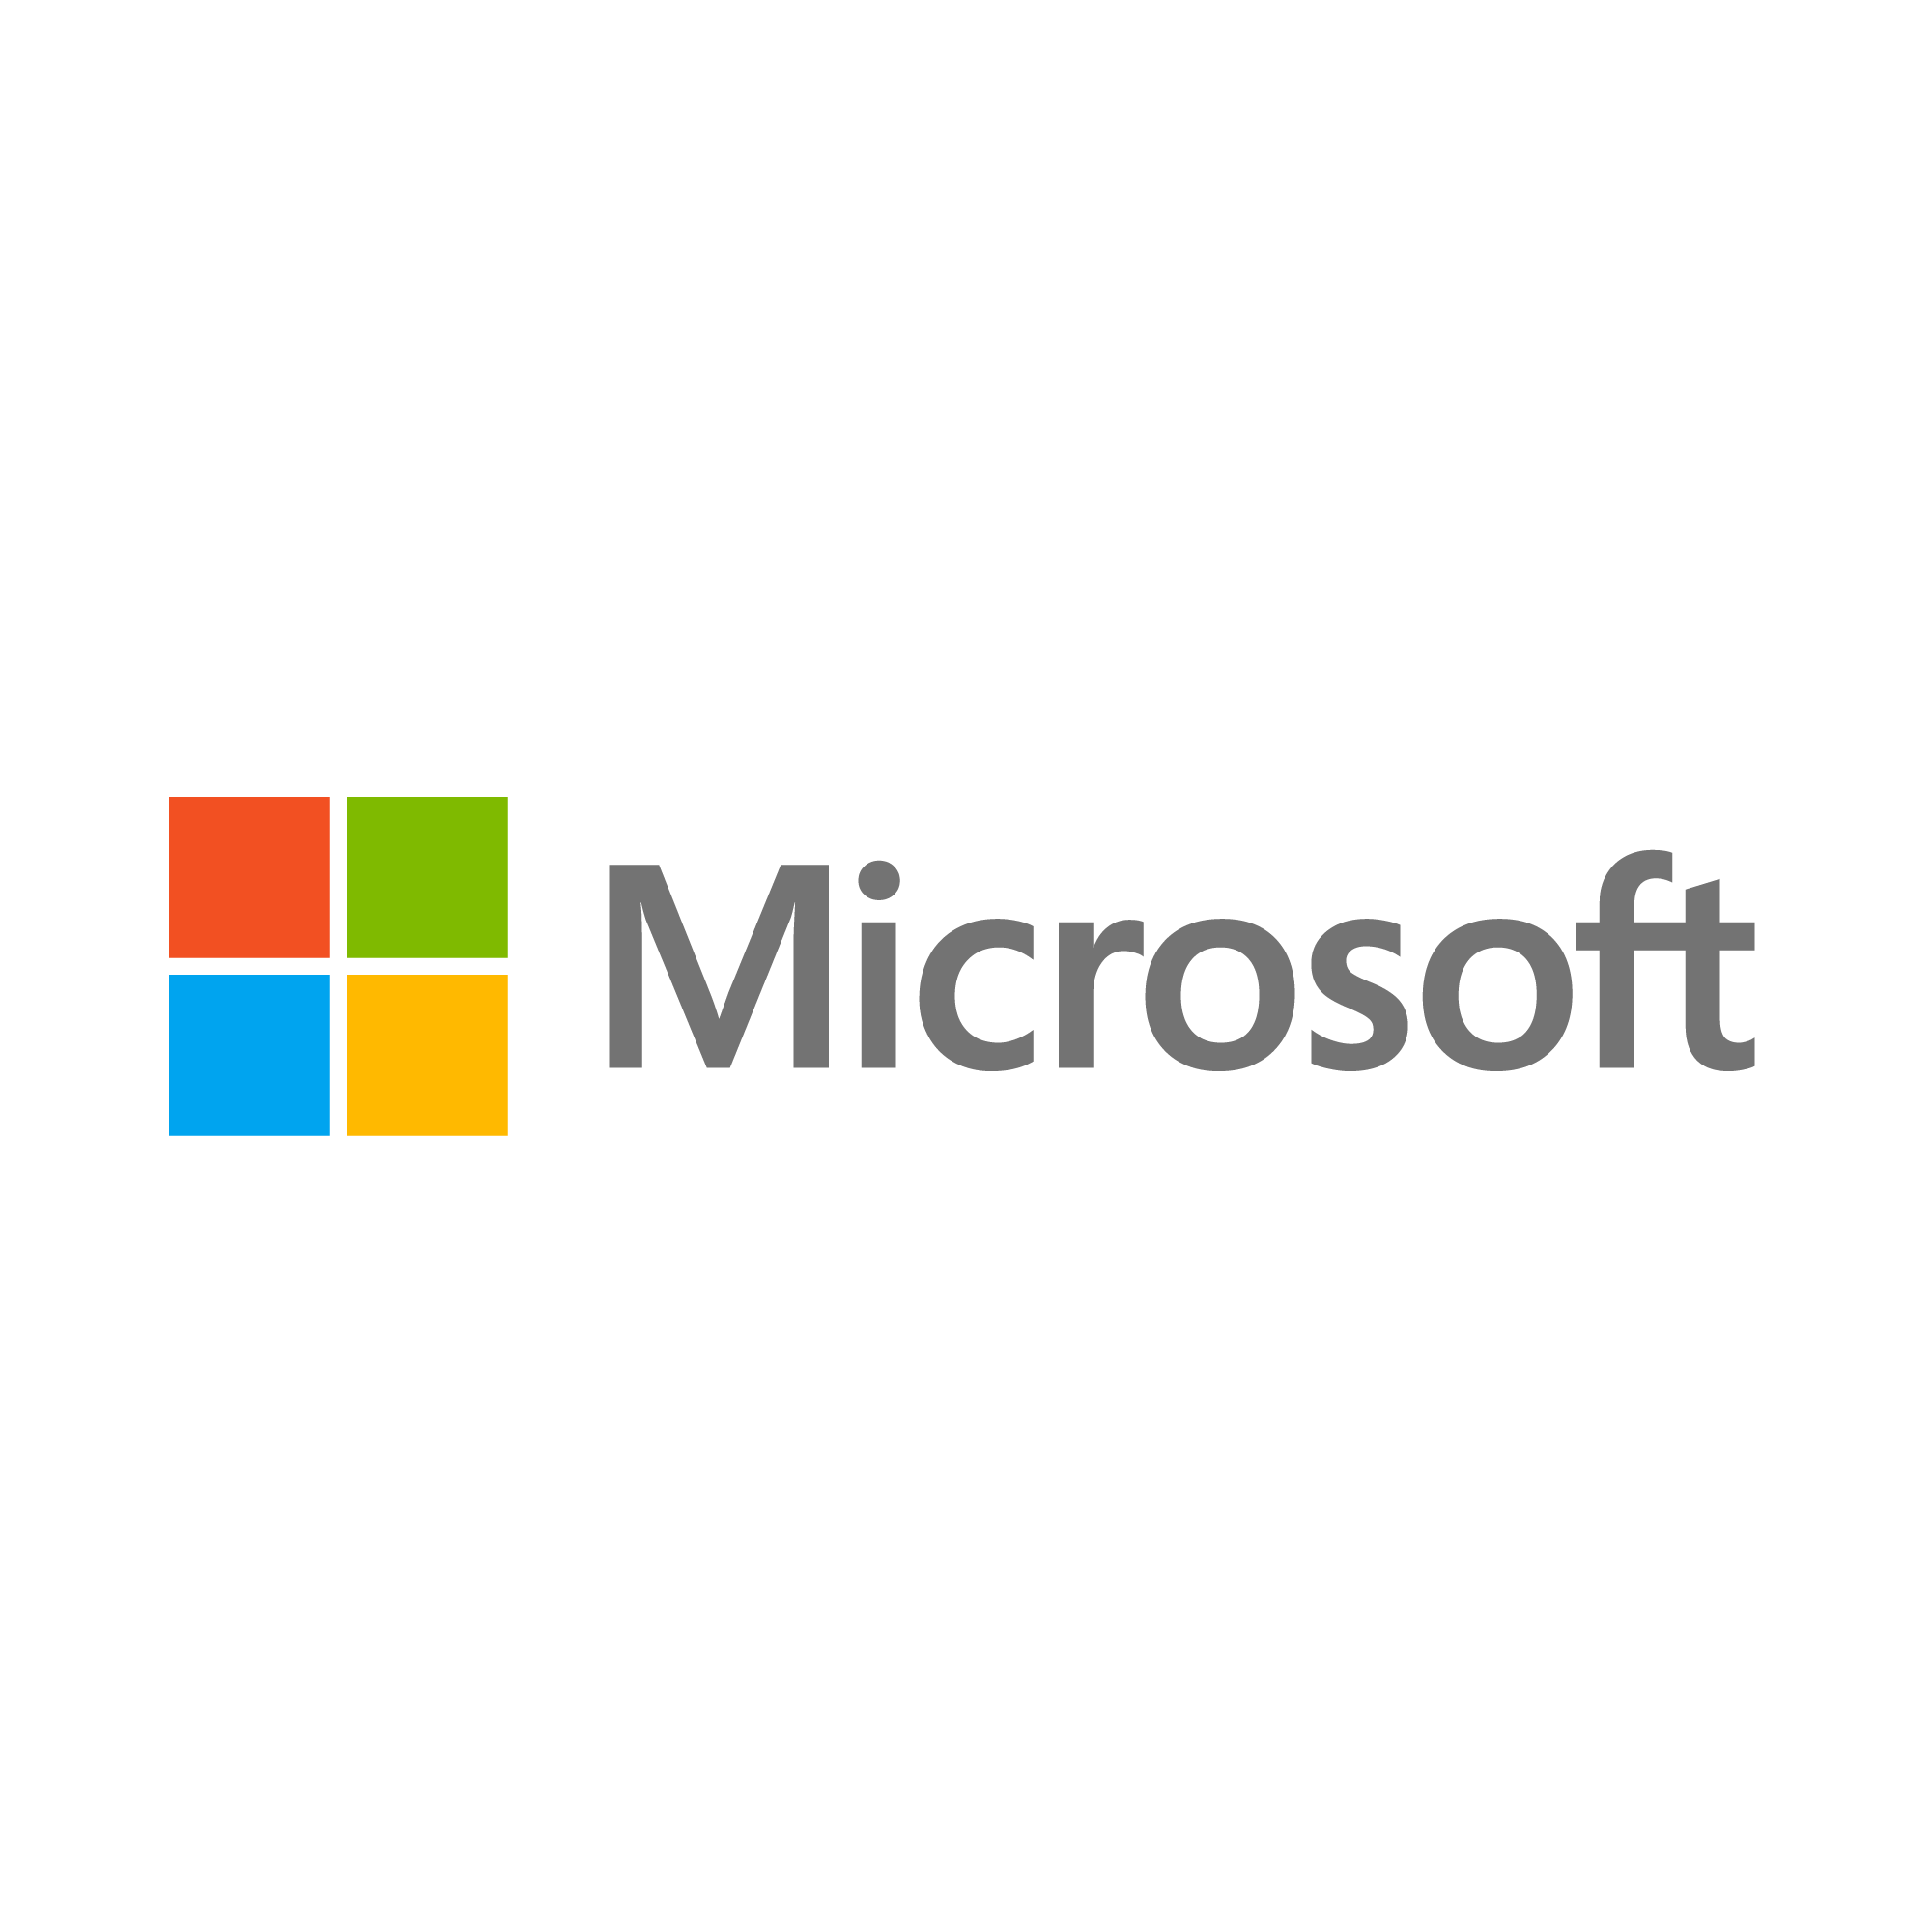 Microsoft_2000